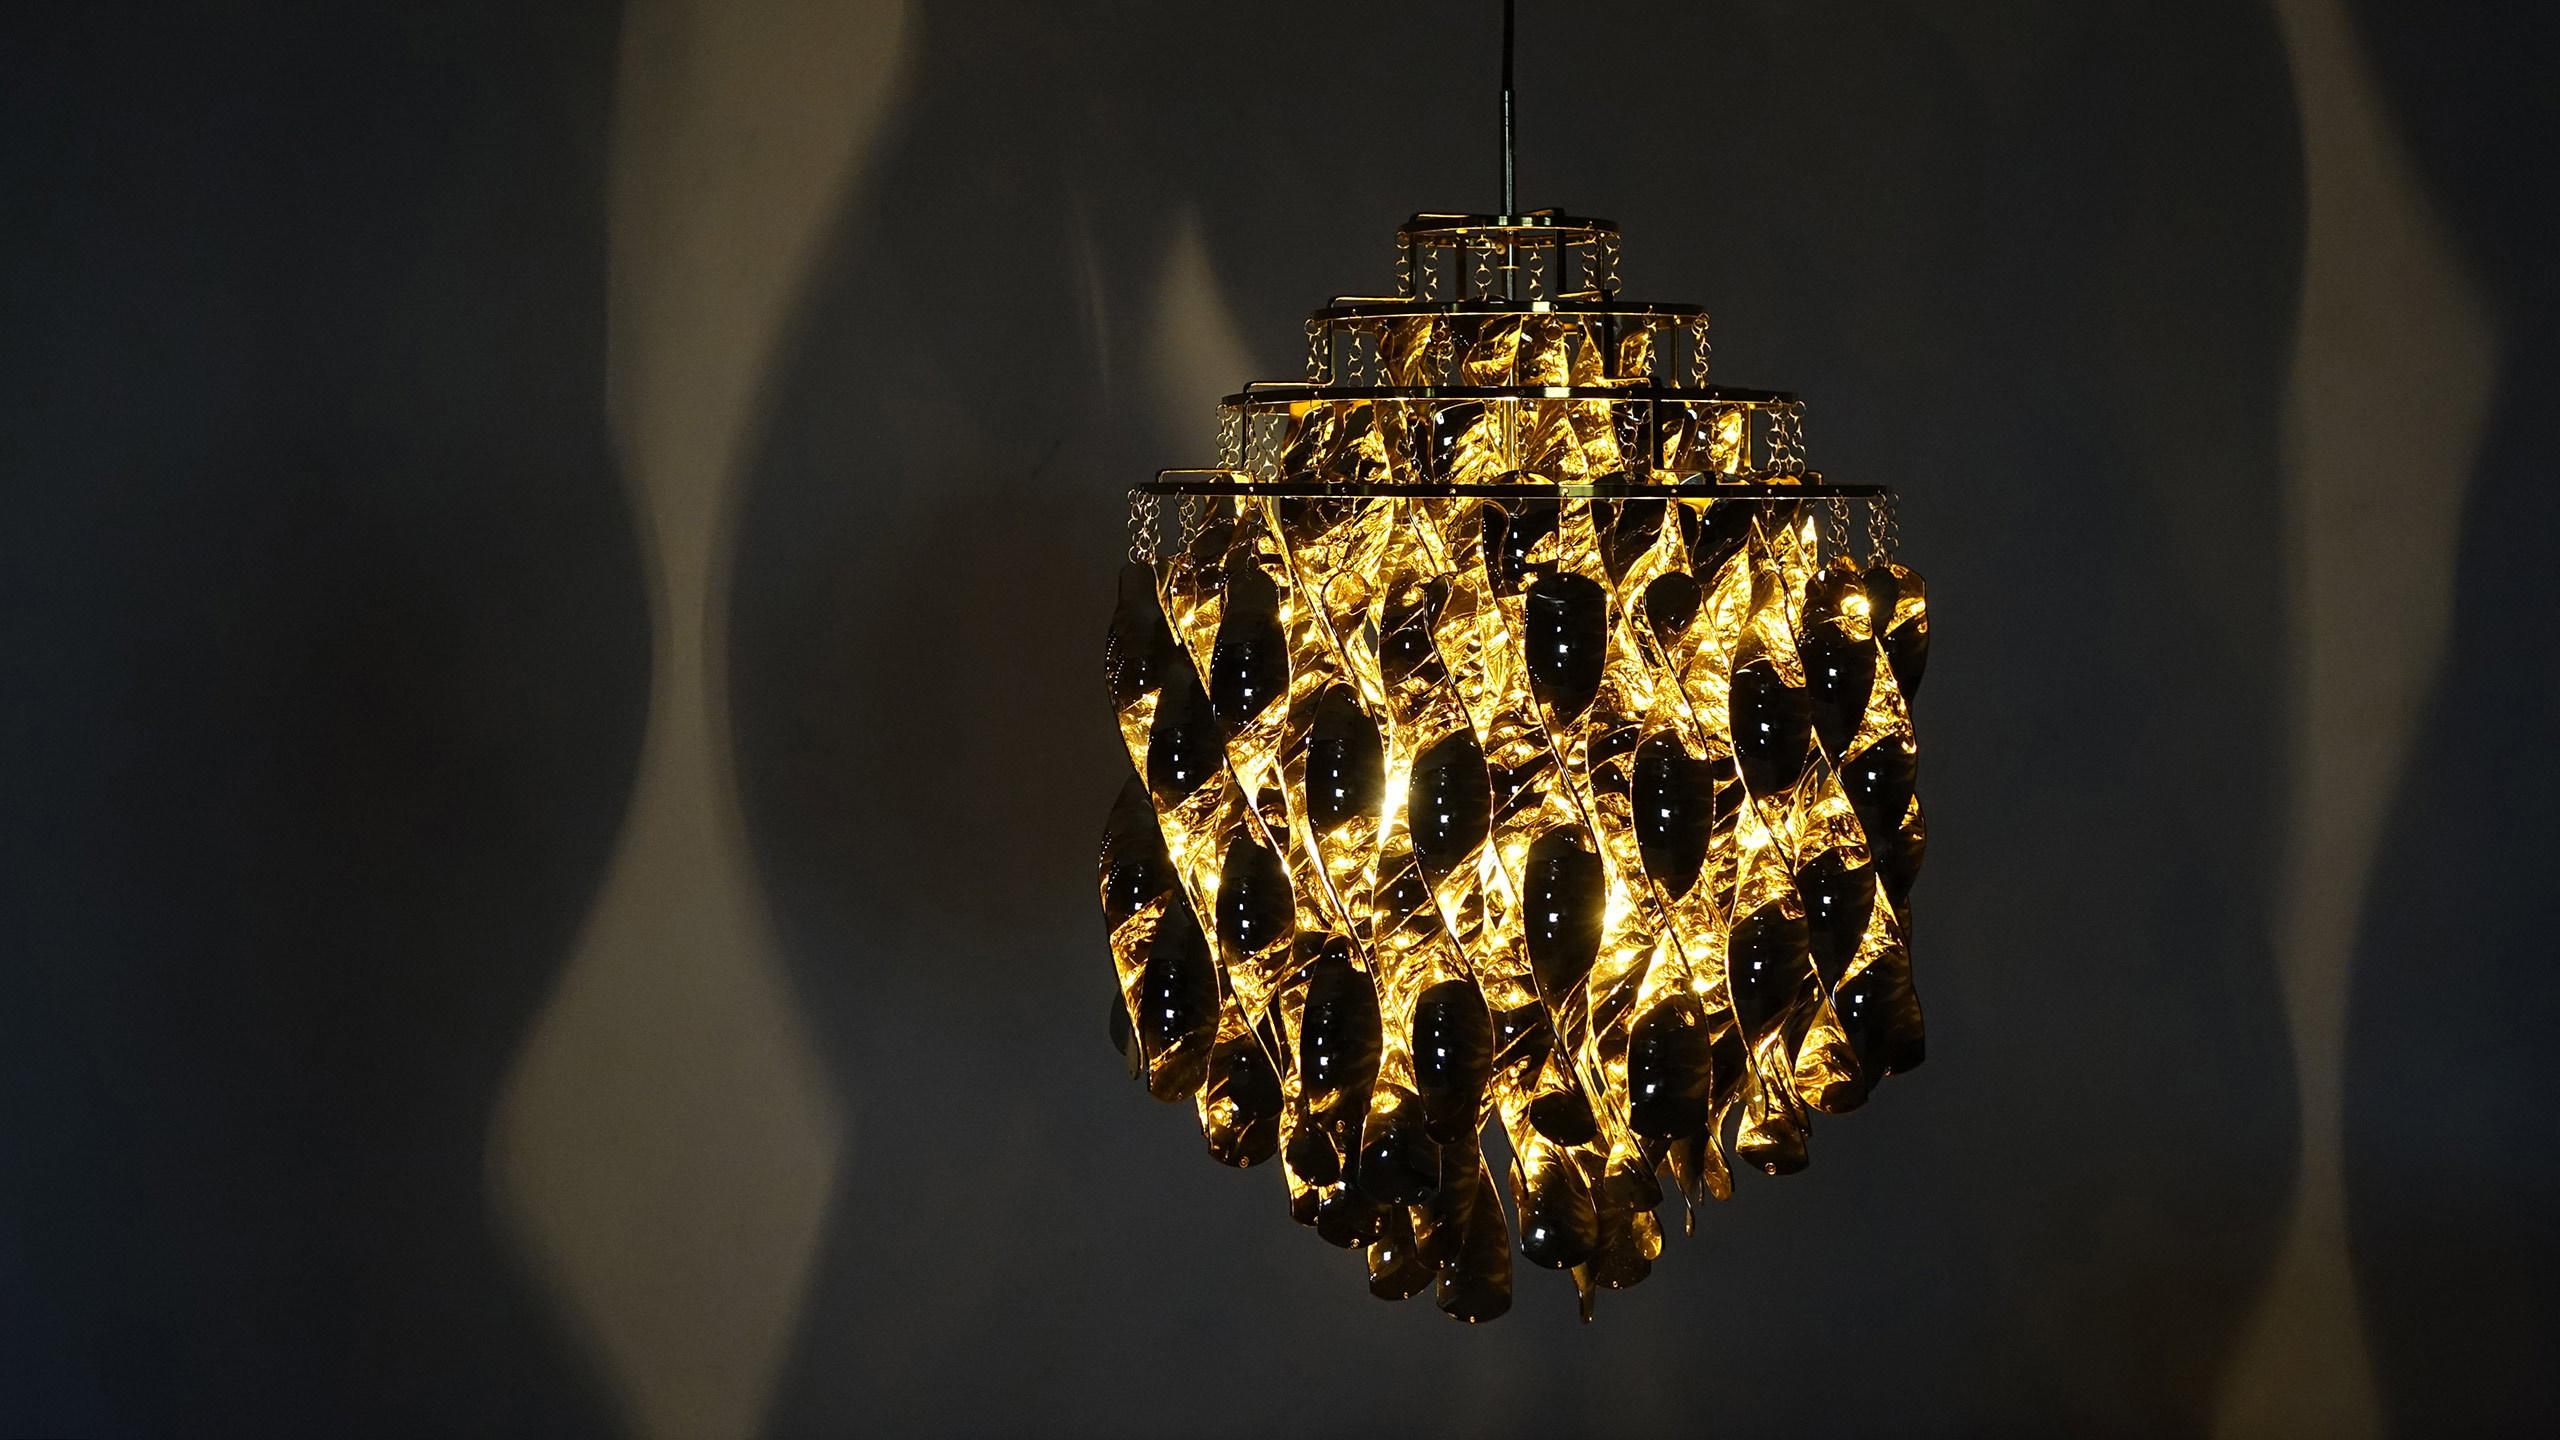 verner panton 1969 spiral gold verpan fun lamp. Black Bedroom Furniture Sets. Home Design Ideas